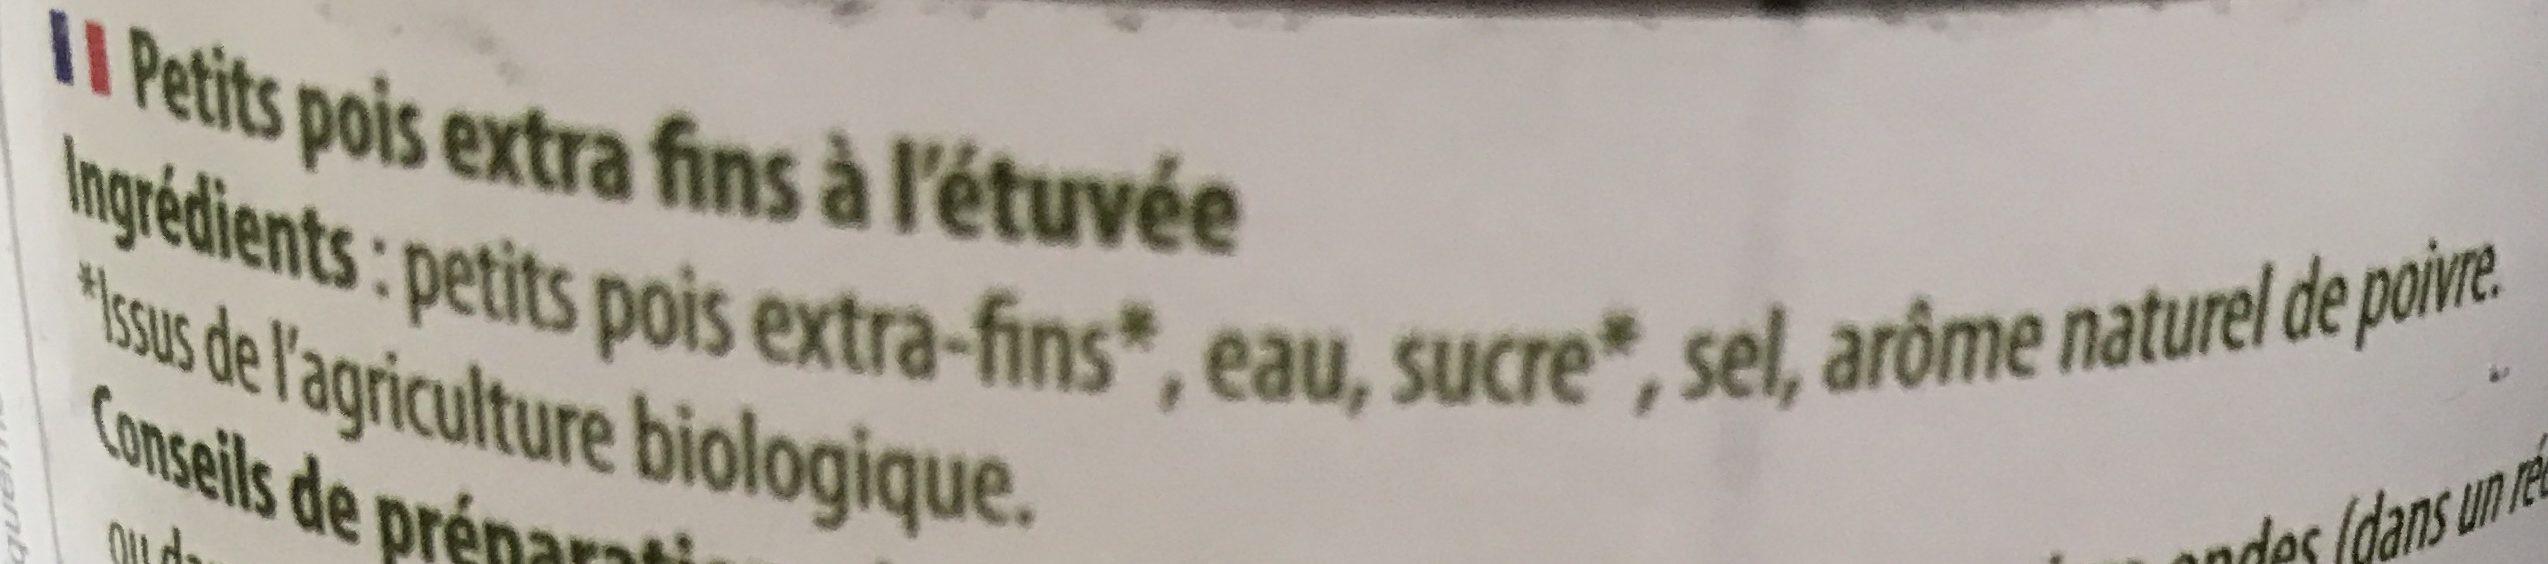 Petits pois à l'étuvée - Ingrediënten - fr